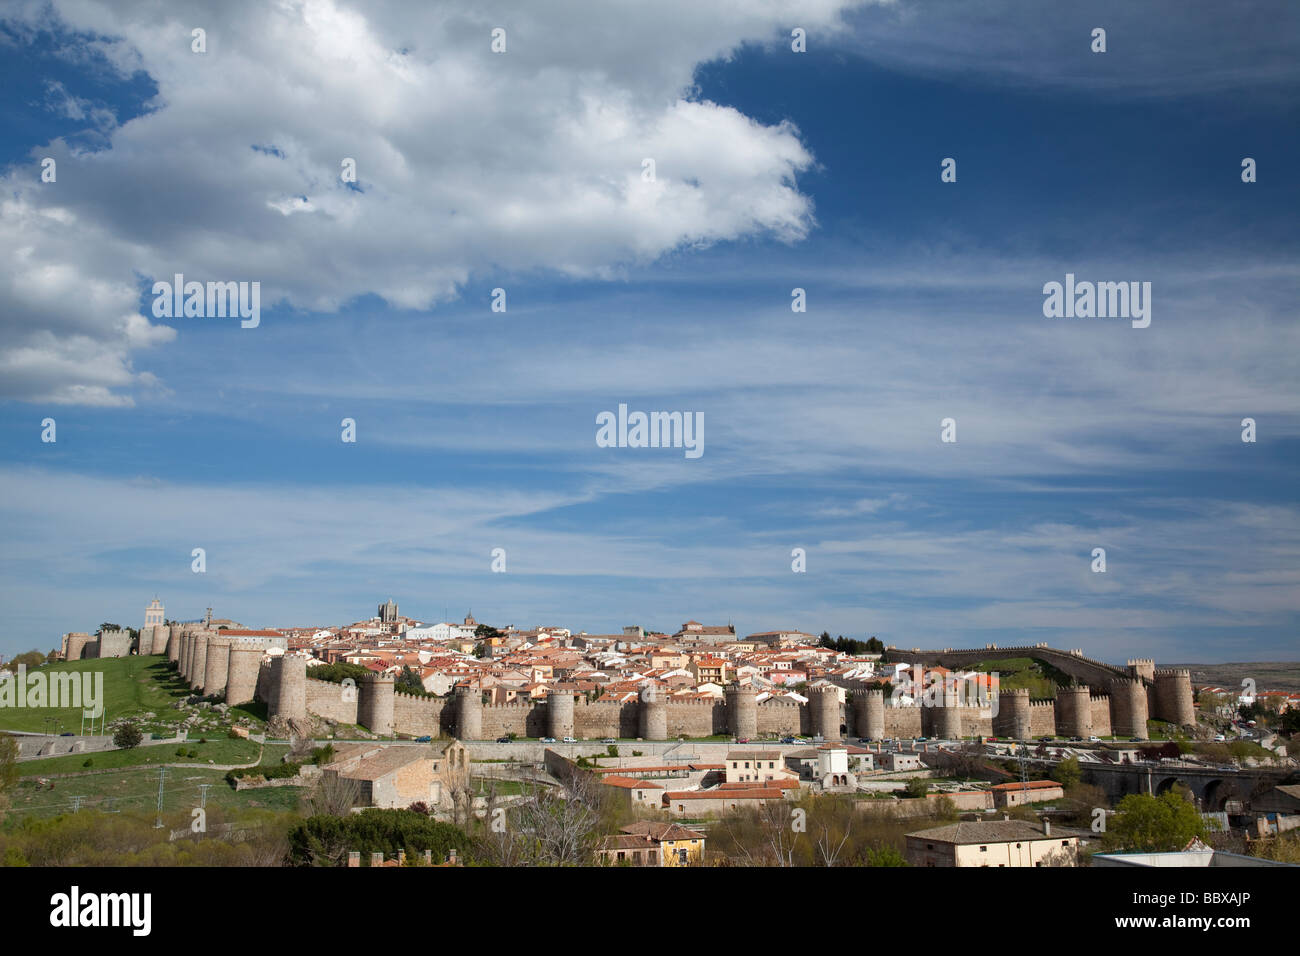 Walled city of Avila de los Caballeros Spain - Stock Image